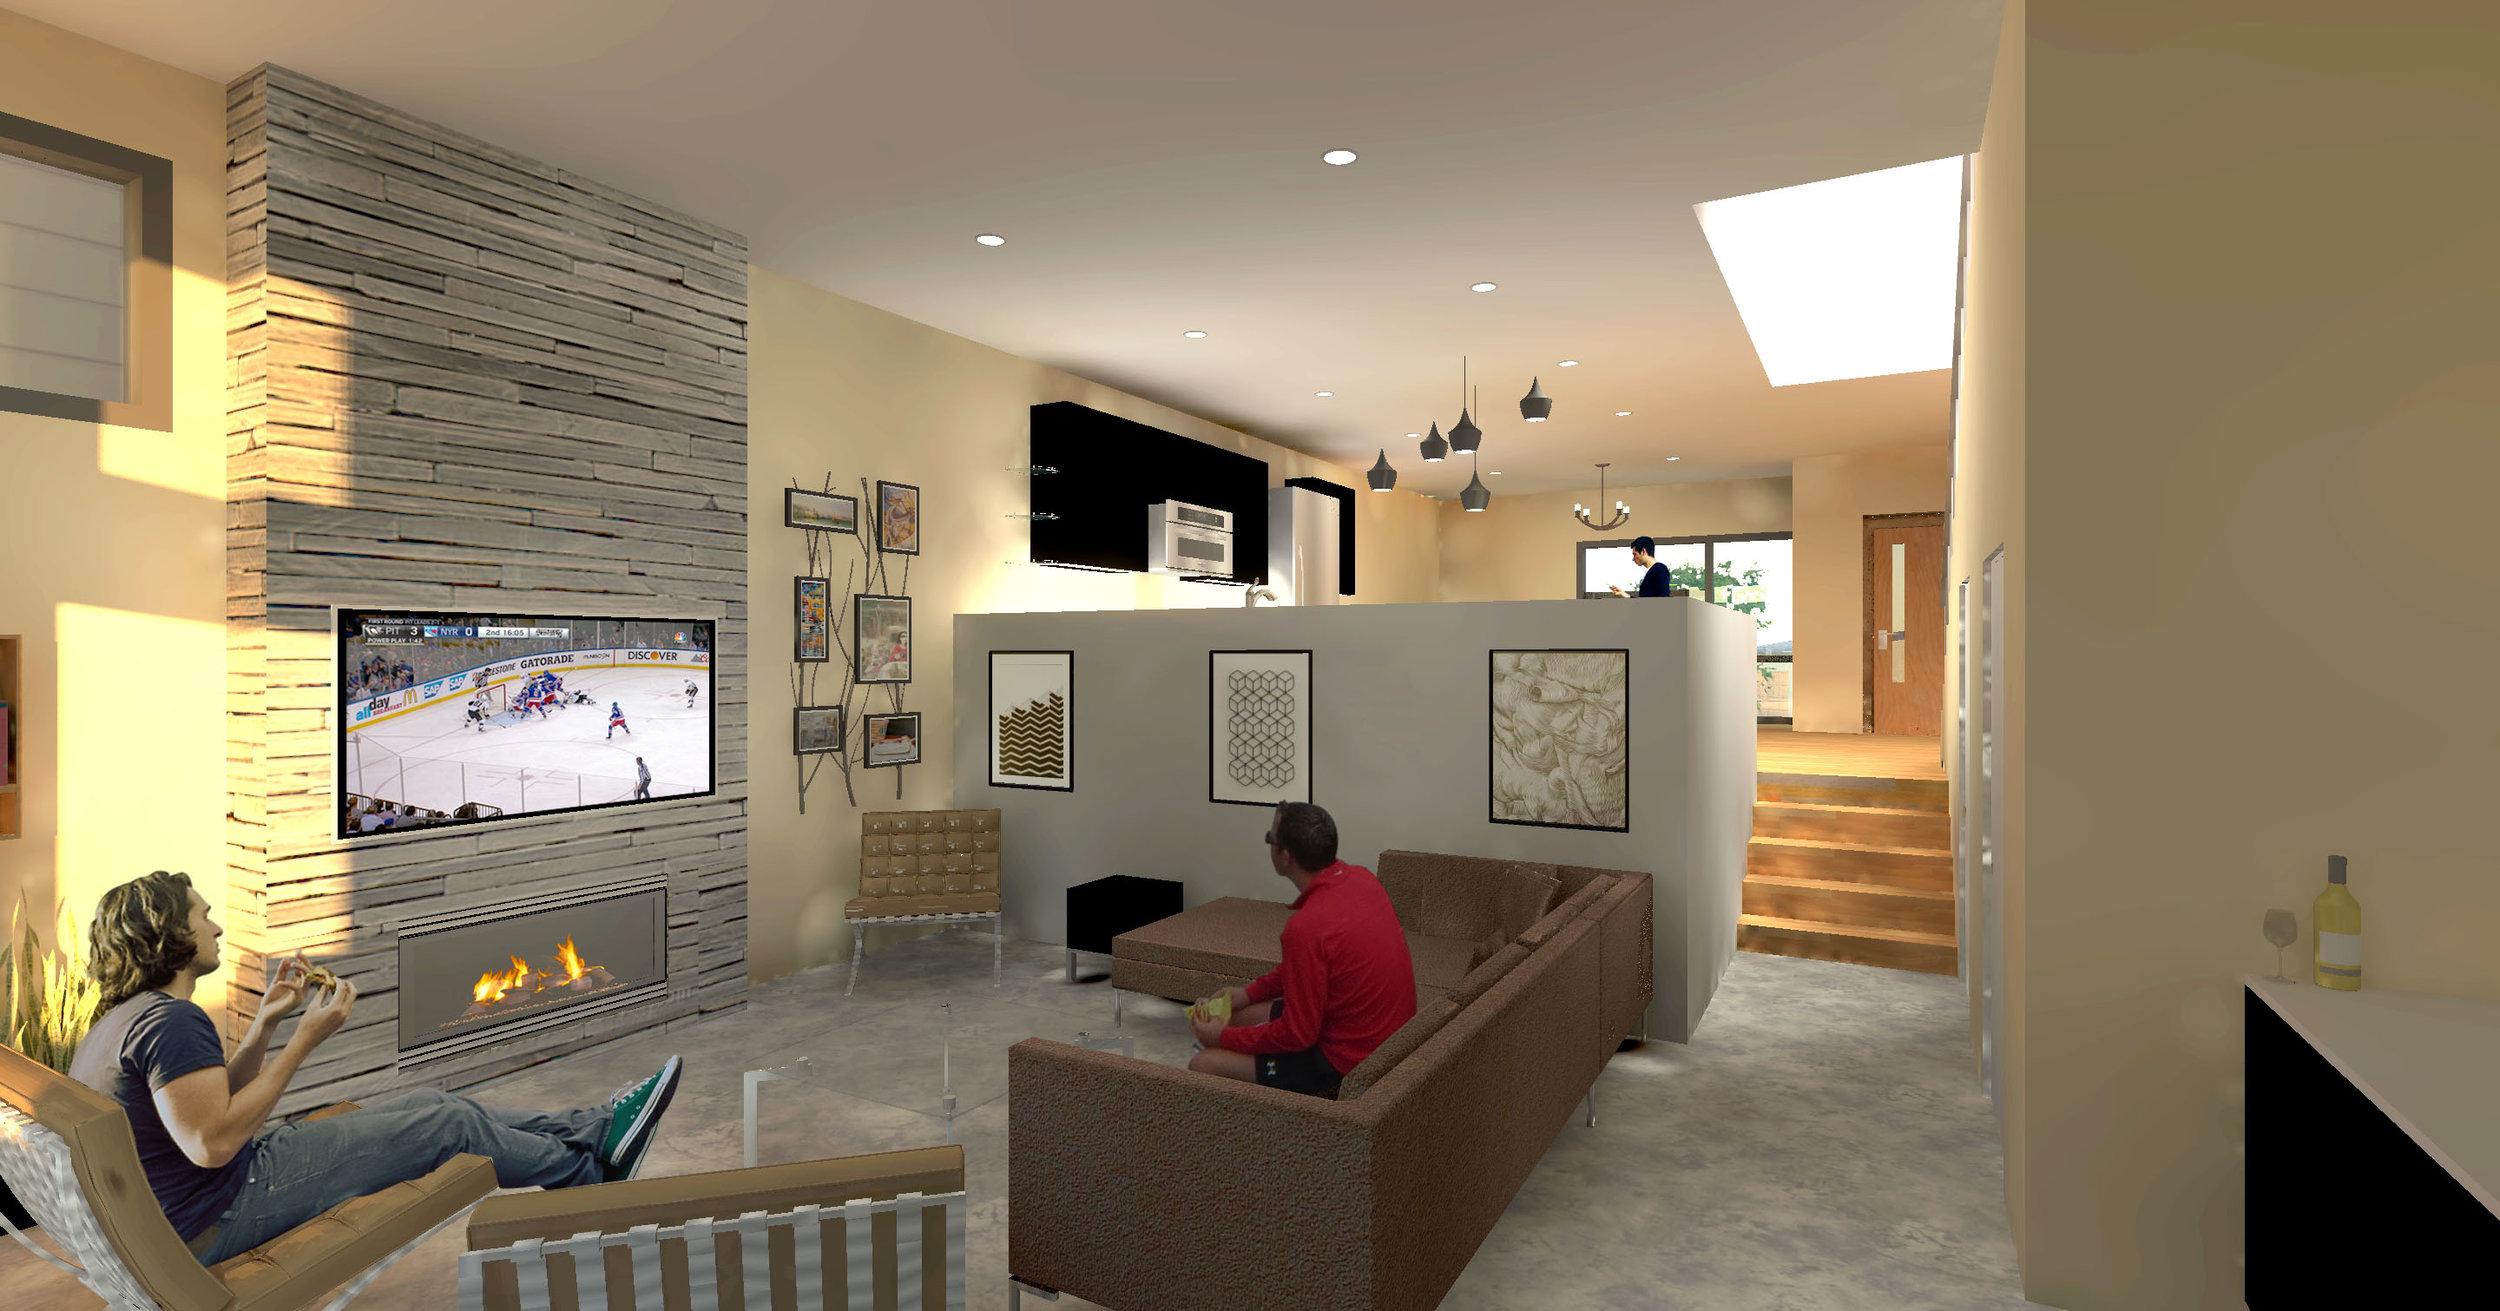 N Euclid Ave interior 3 living room.jpg